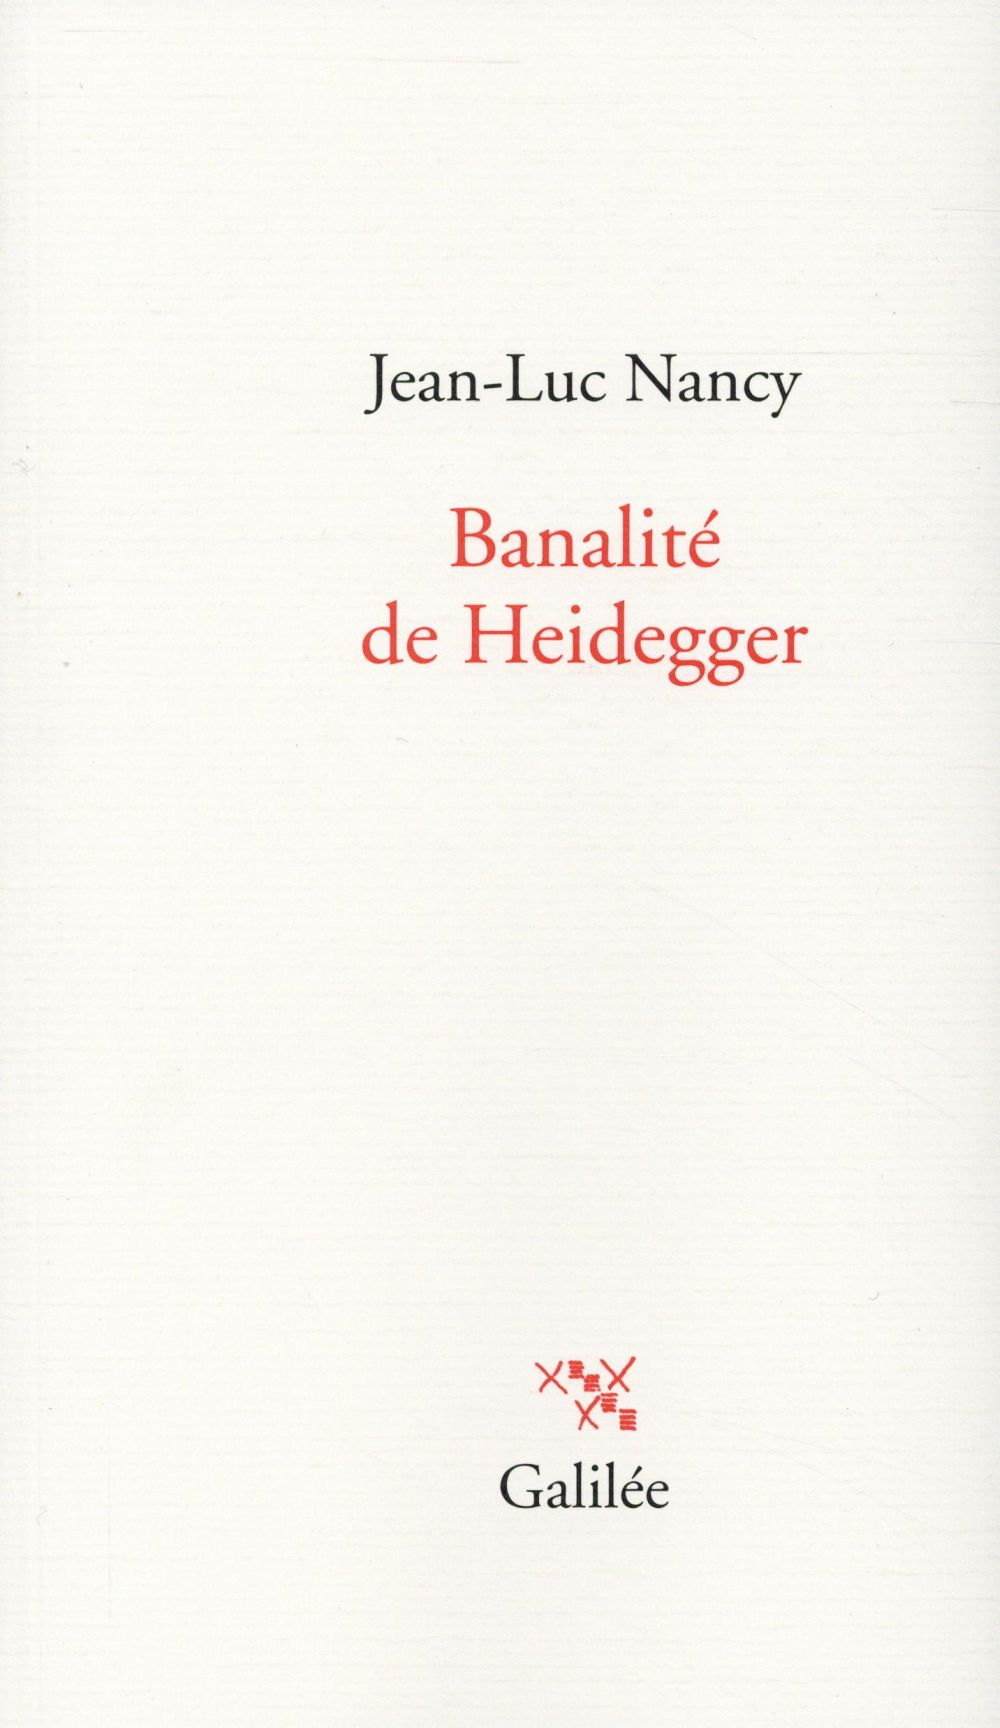 BANALITE DE HEIDEGGER